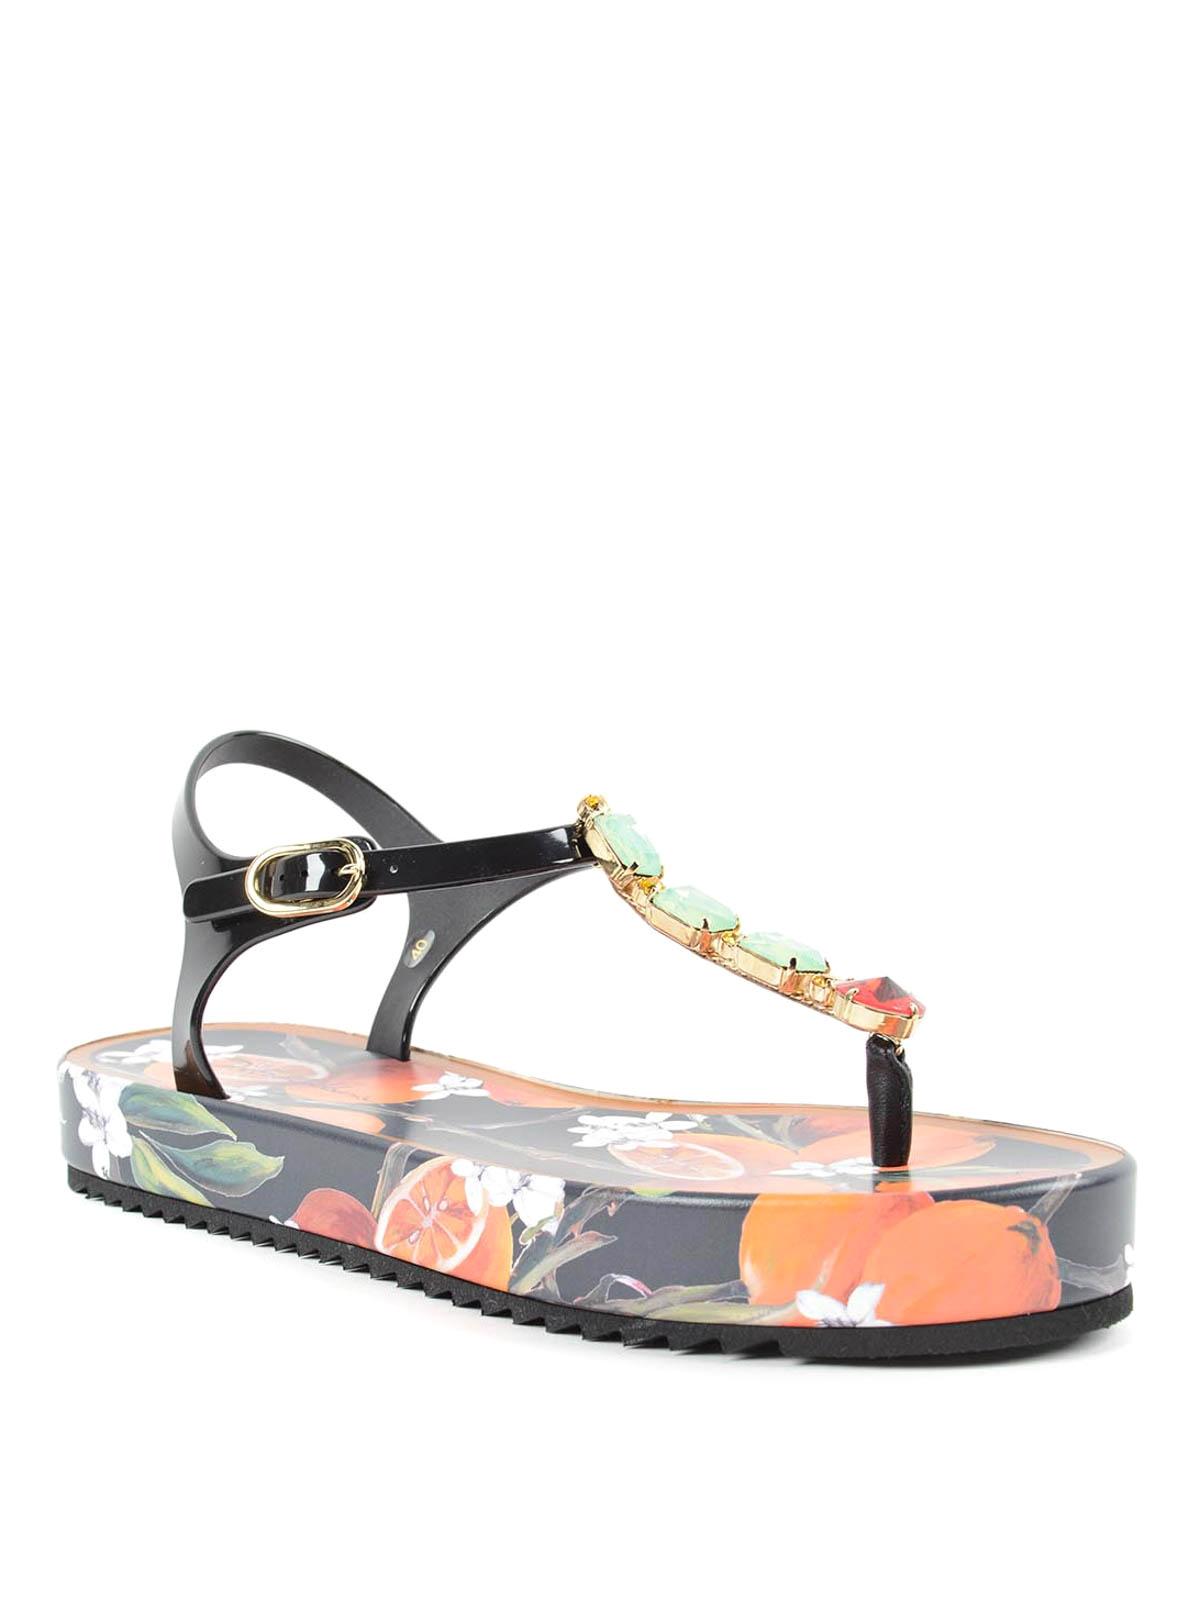 ca7aa6b5ed51 Dolce   Gabbana - Beachwear sandals - flip flops - CW0035 A4374 80999